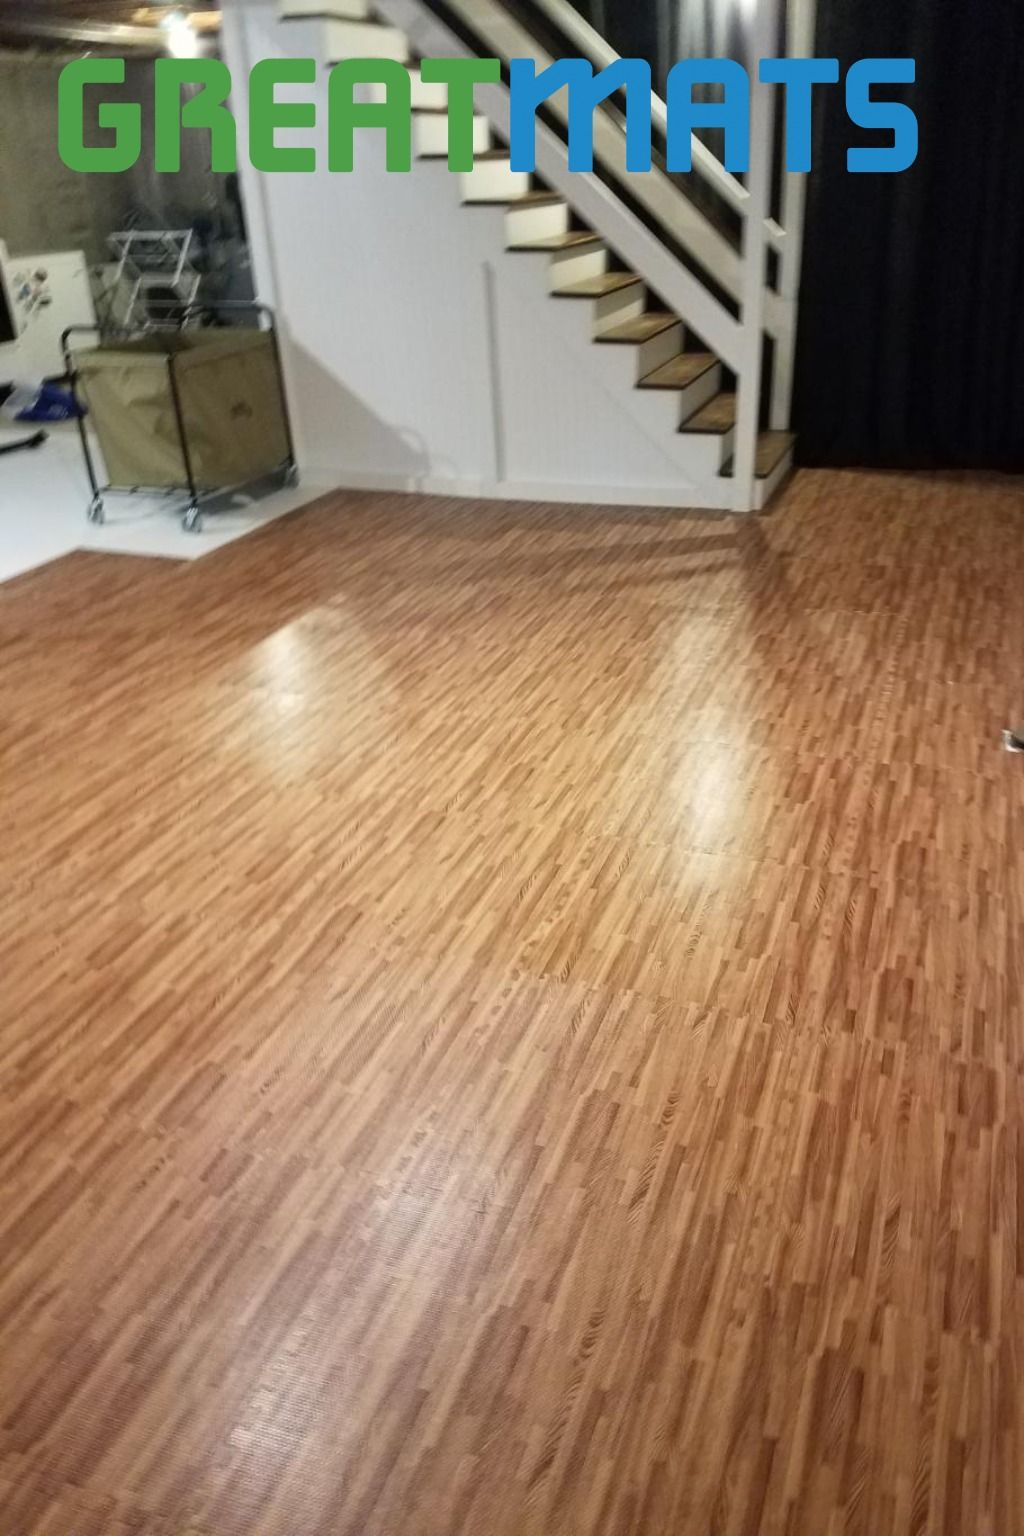 Diy Interlocking Premium Wood Grain Foam Tiles Waterproof Soft Flooring Foam Tiles Foam Tiles Basement Foam Wood Flooring